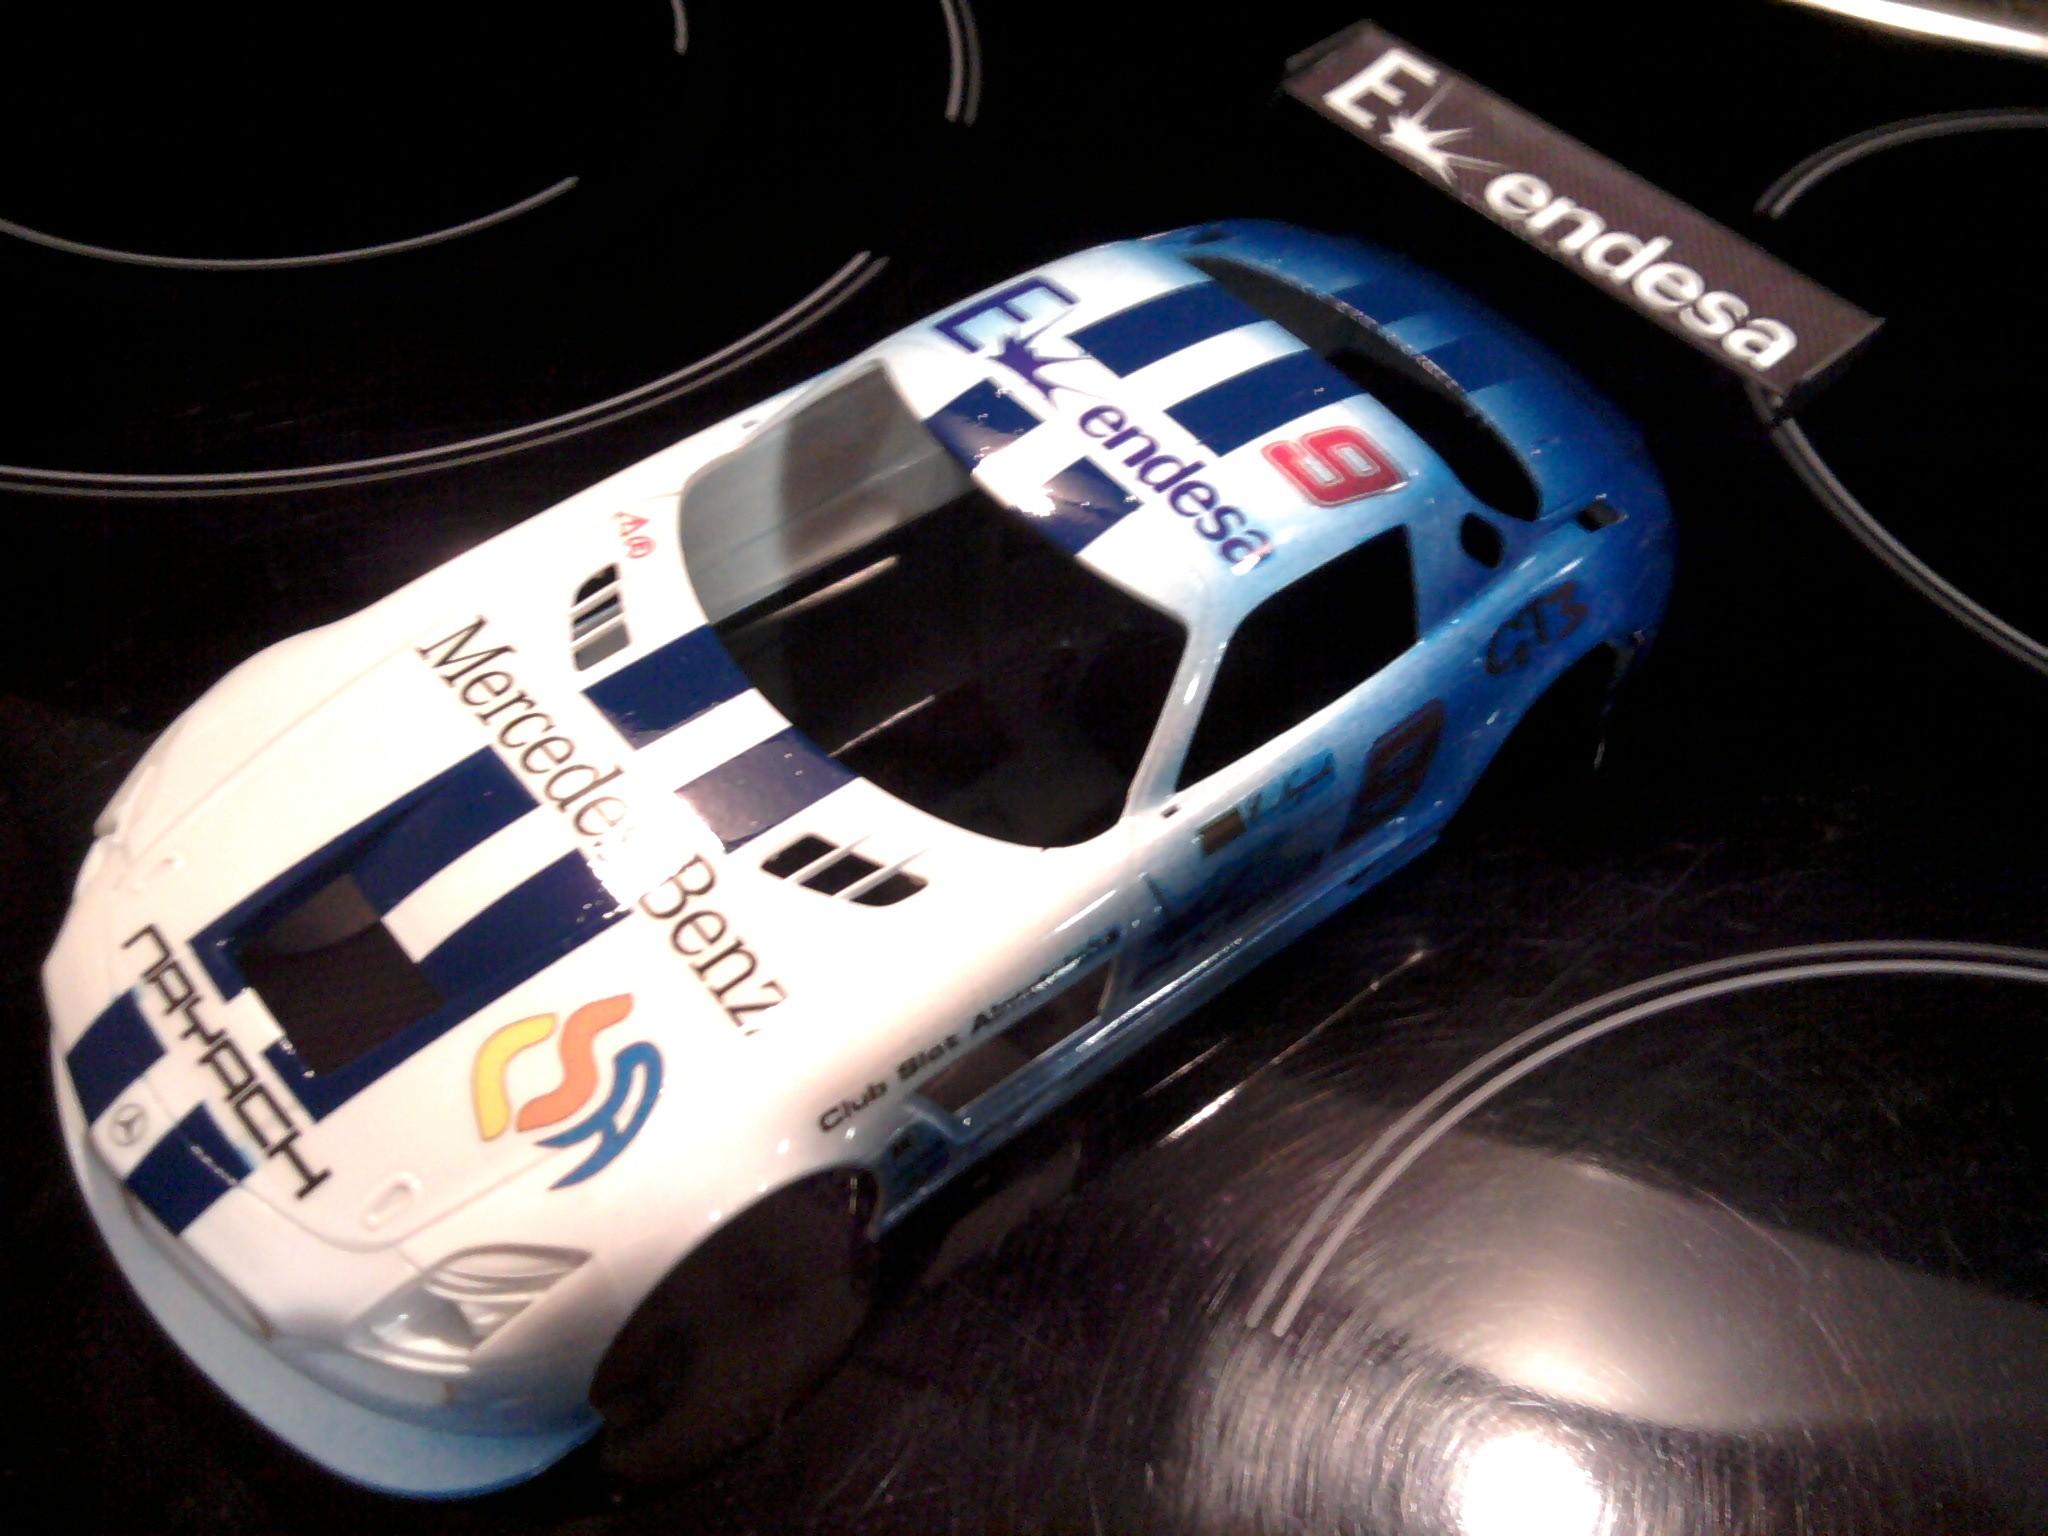 Mercedes SLS AMG GT3 1:24 encargo de D. Eduardo N. por SDH Diseños.